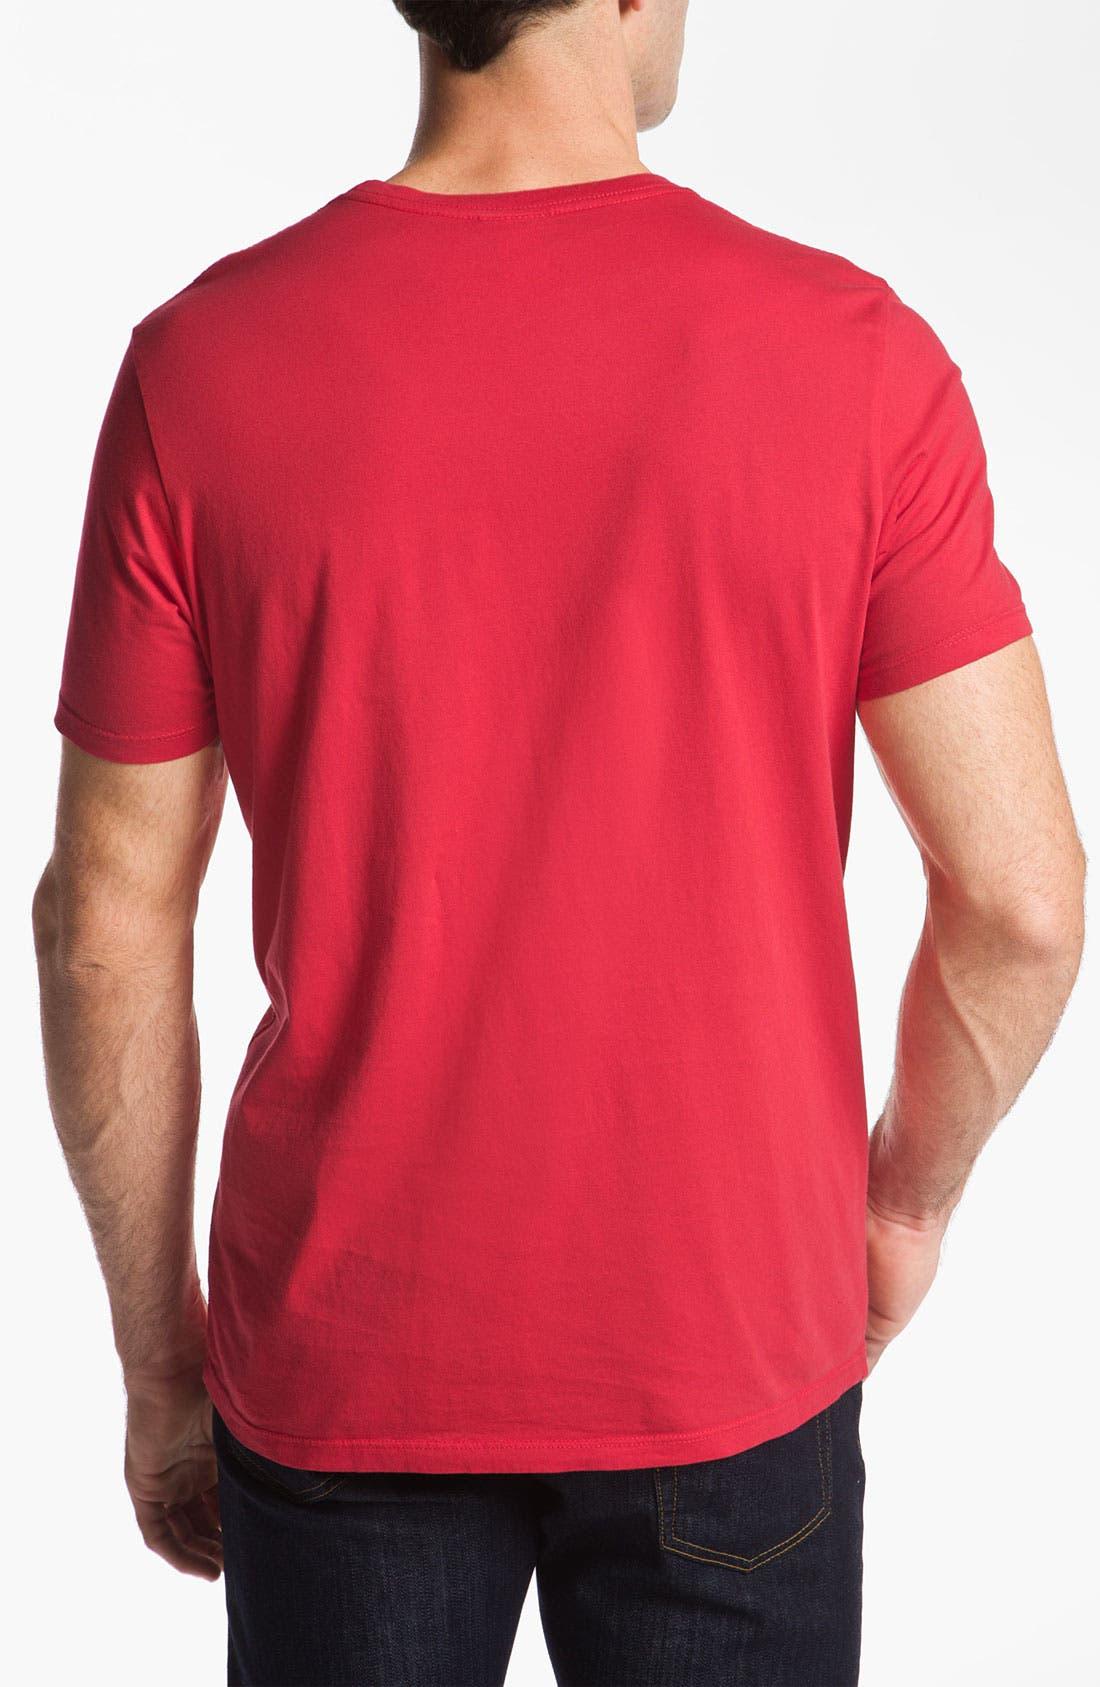 'New England Patriots' T-Shirt,                             Alternate thumbnail 3, color,                             621